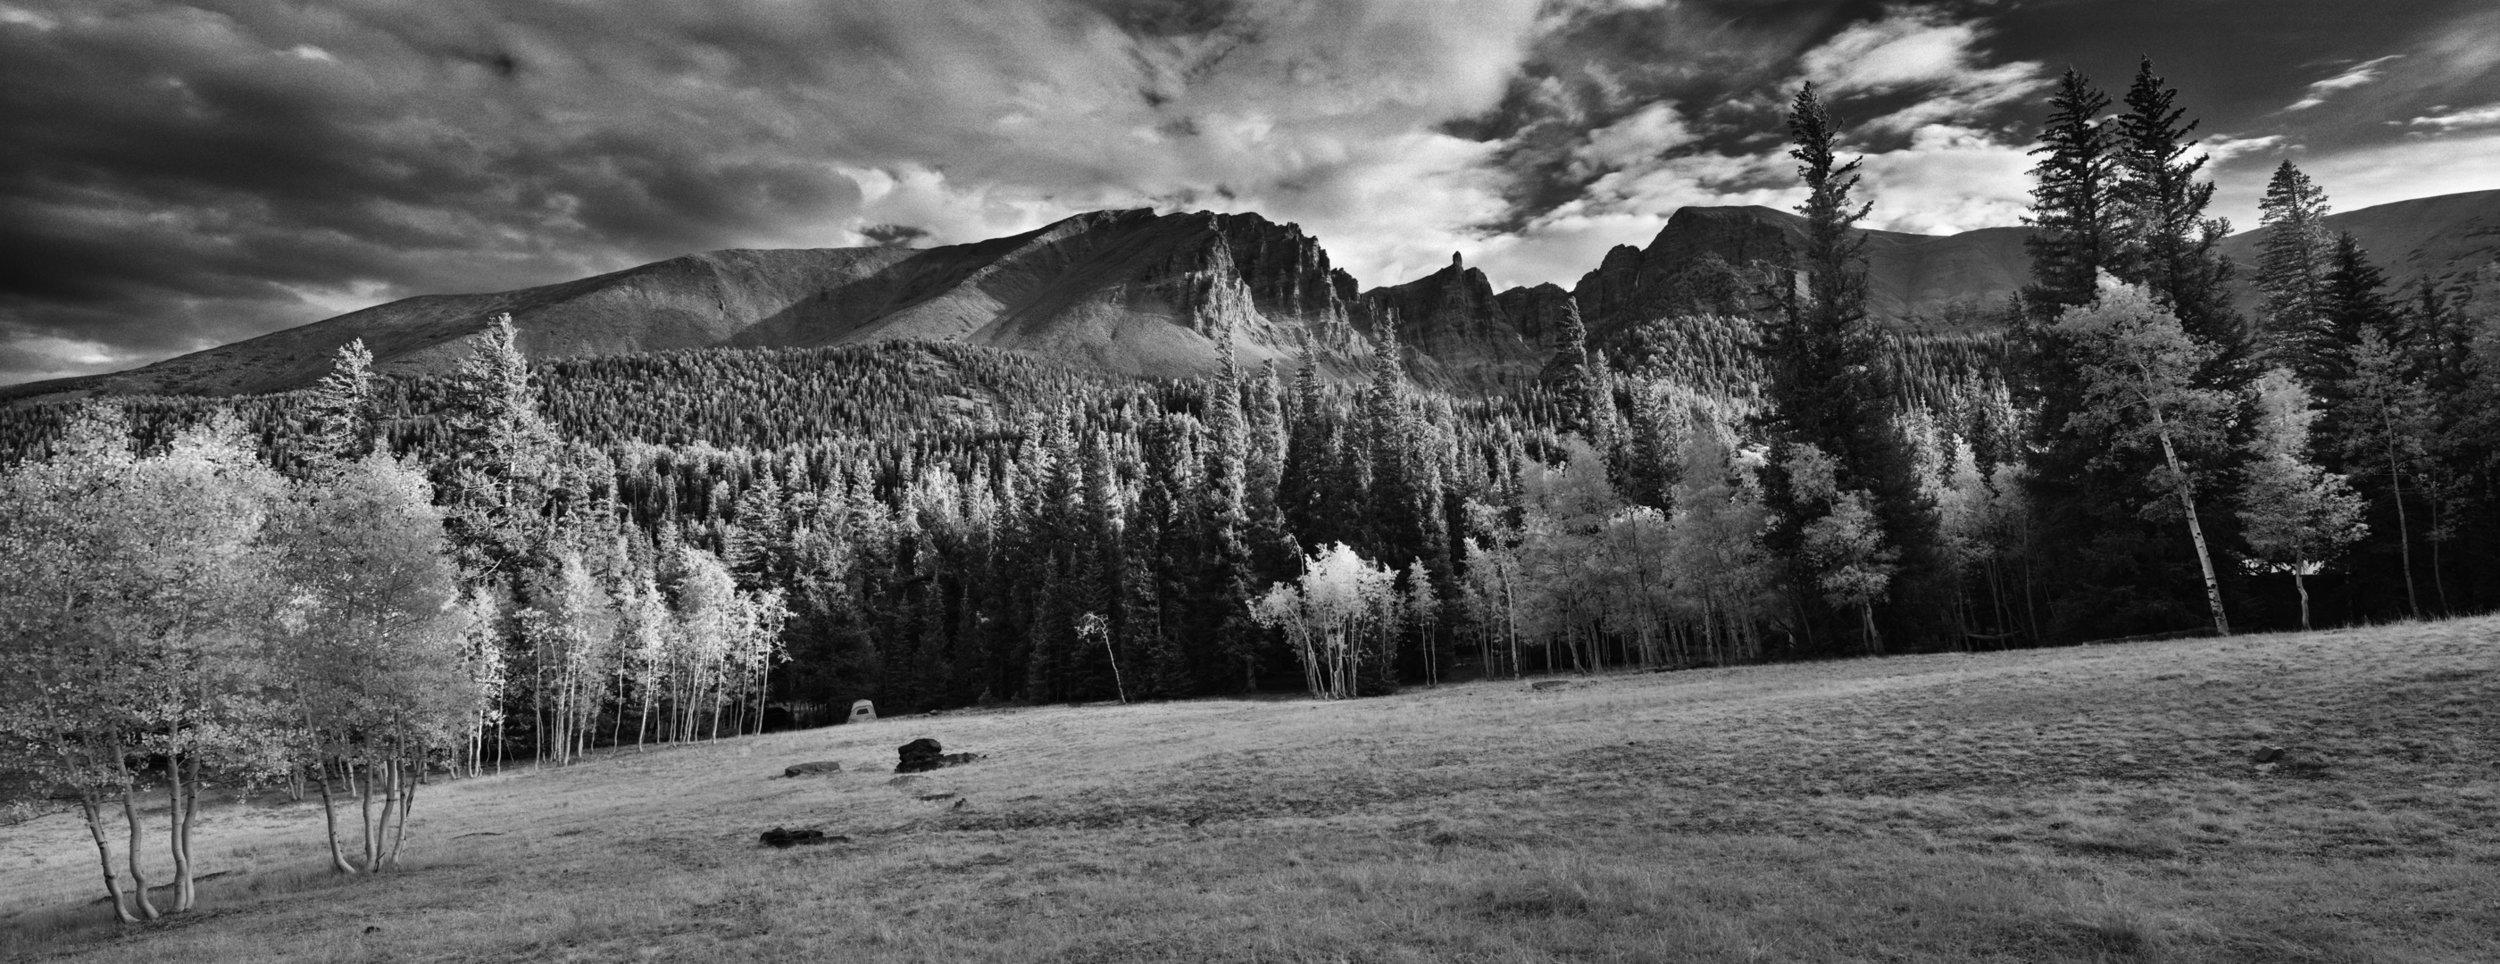 Wheeler Peak Campground- Great Basin National Park, Nevada